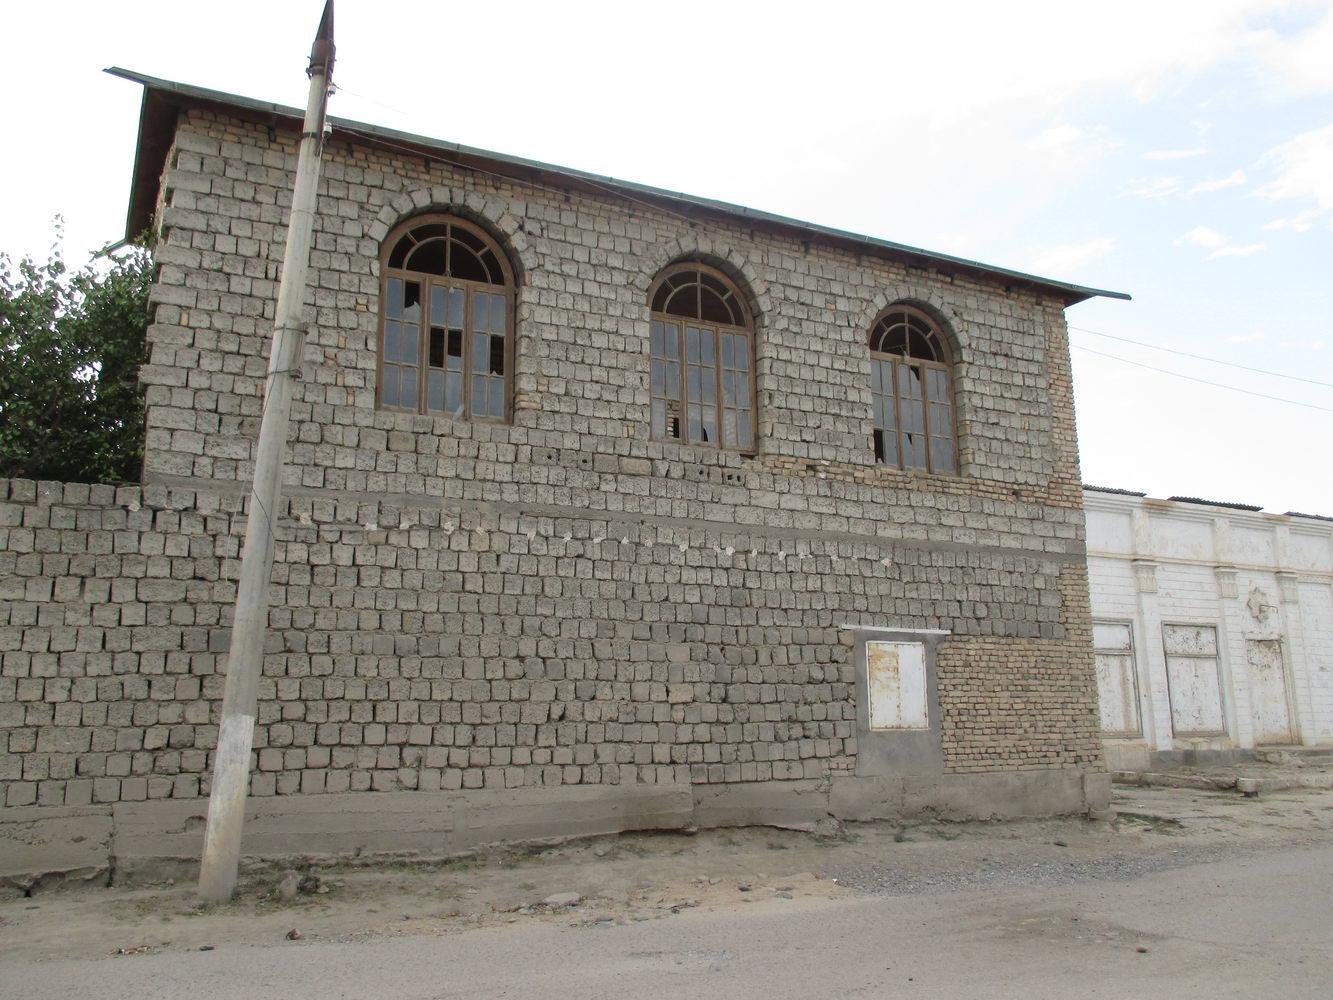 дома и улицы. не туристический самарканд. узбекистан